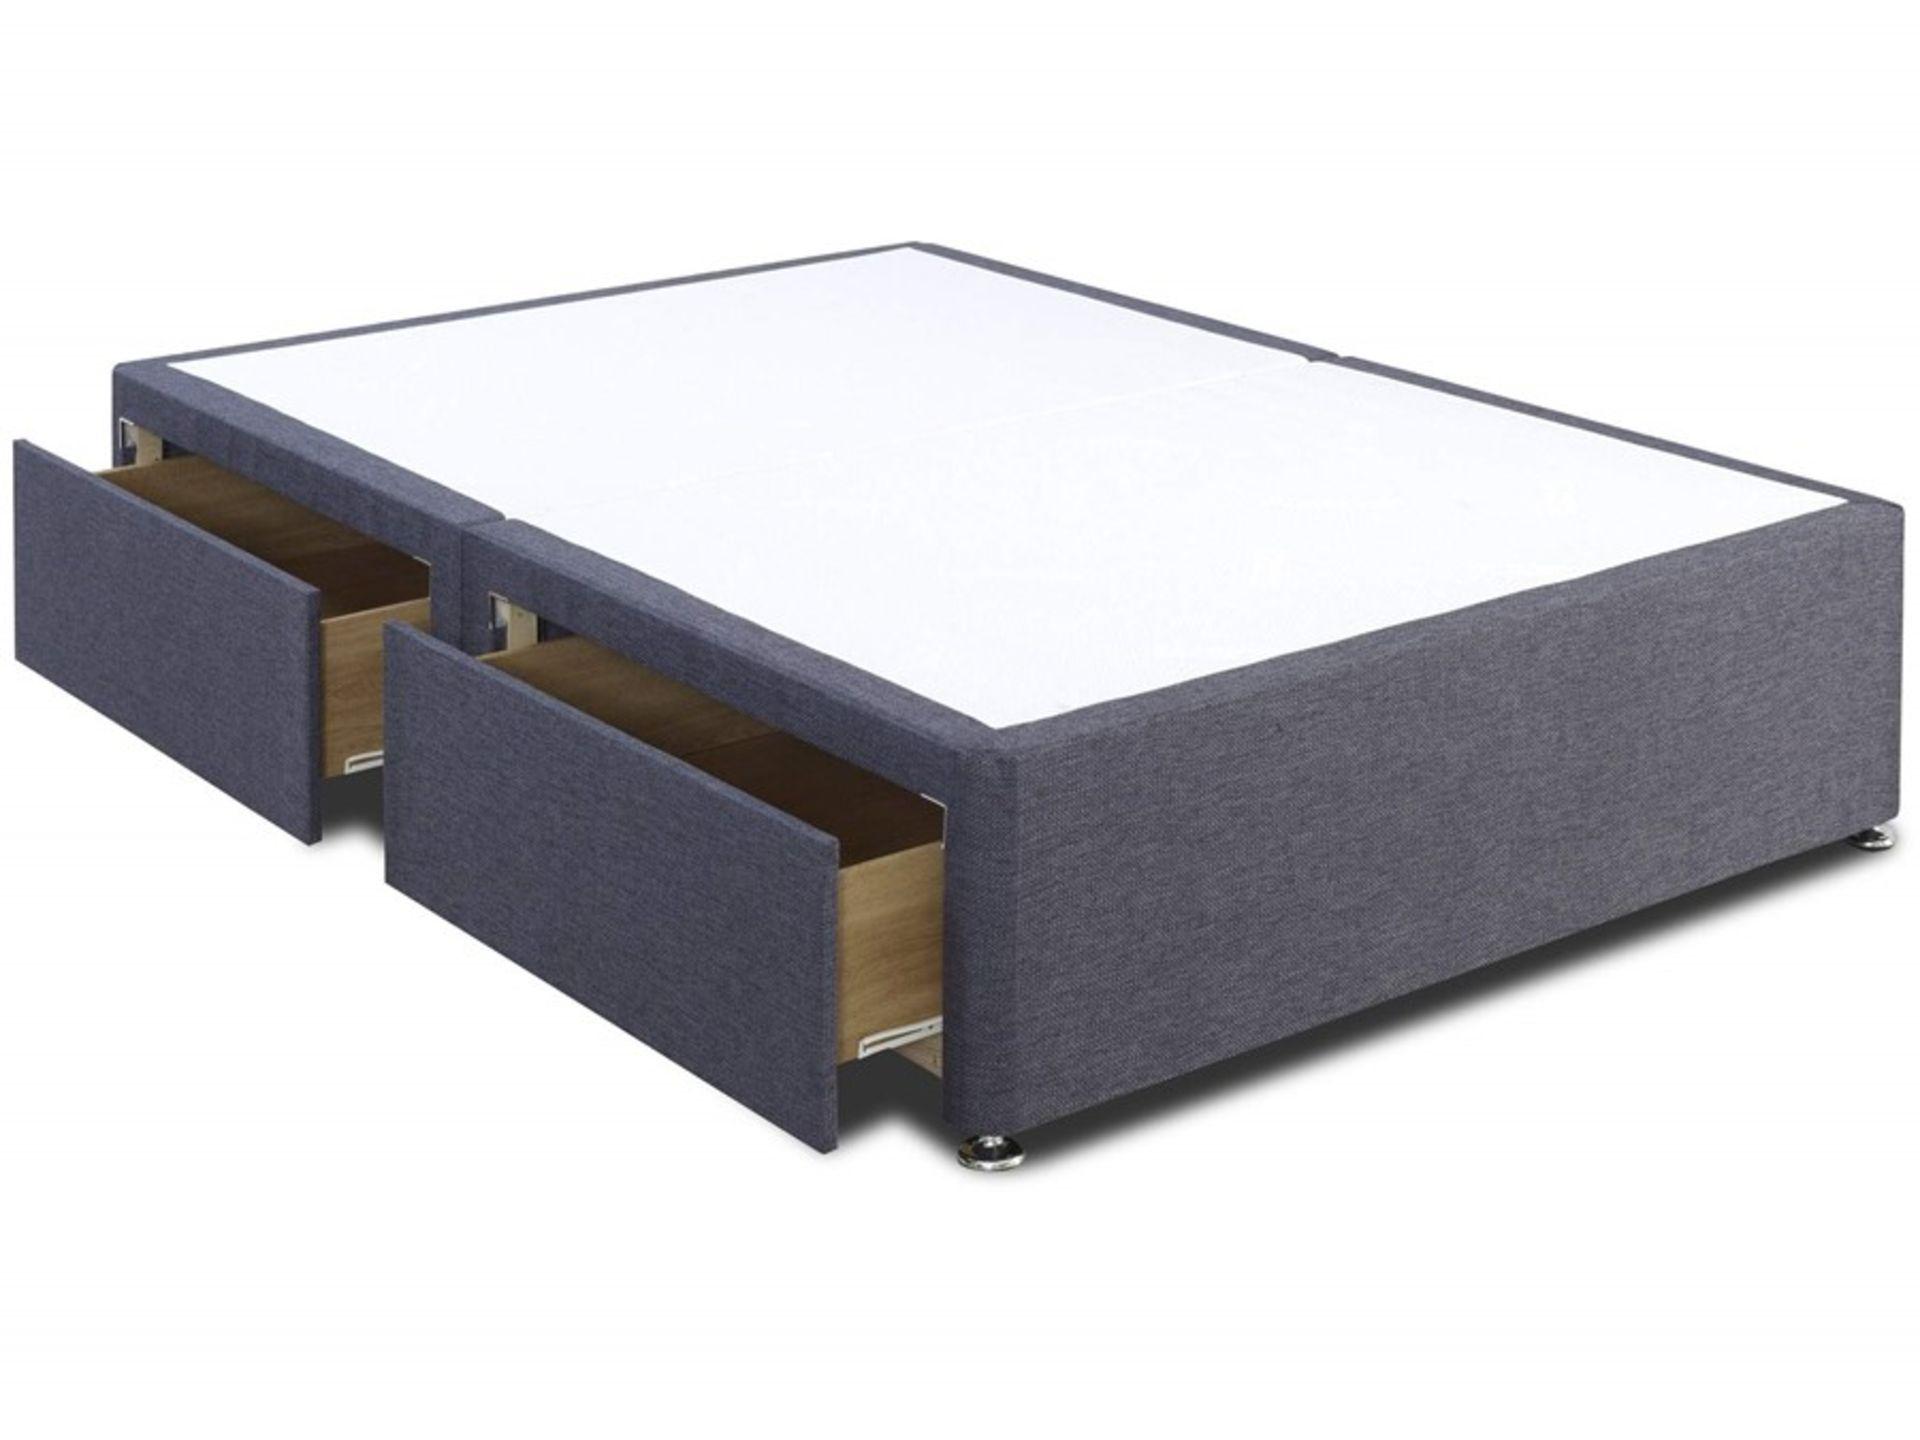 Lot 116 - 1 GRADE A BAGGED 2 DRAWER SINGLE PLATFORM TOP DIVAN BED BASE IN SLATE GREY - SIZE 3FT / RRP £249.